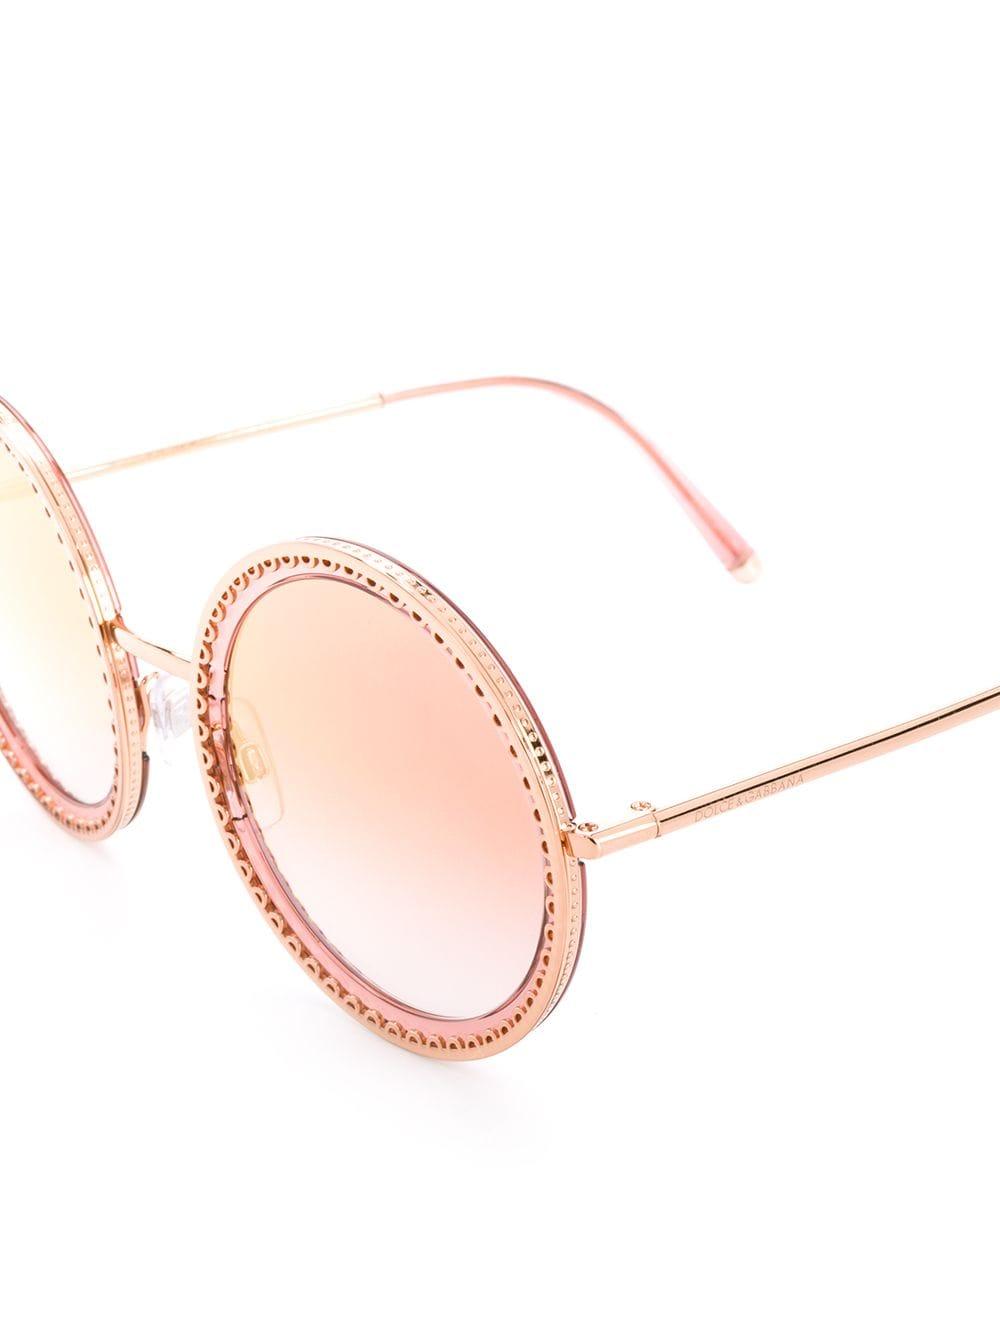 3f49683c64b6 Eyewear gafas de sol cuore sacro - rosa